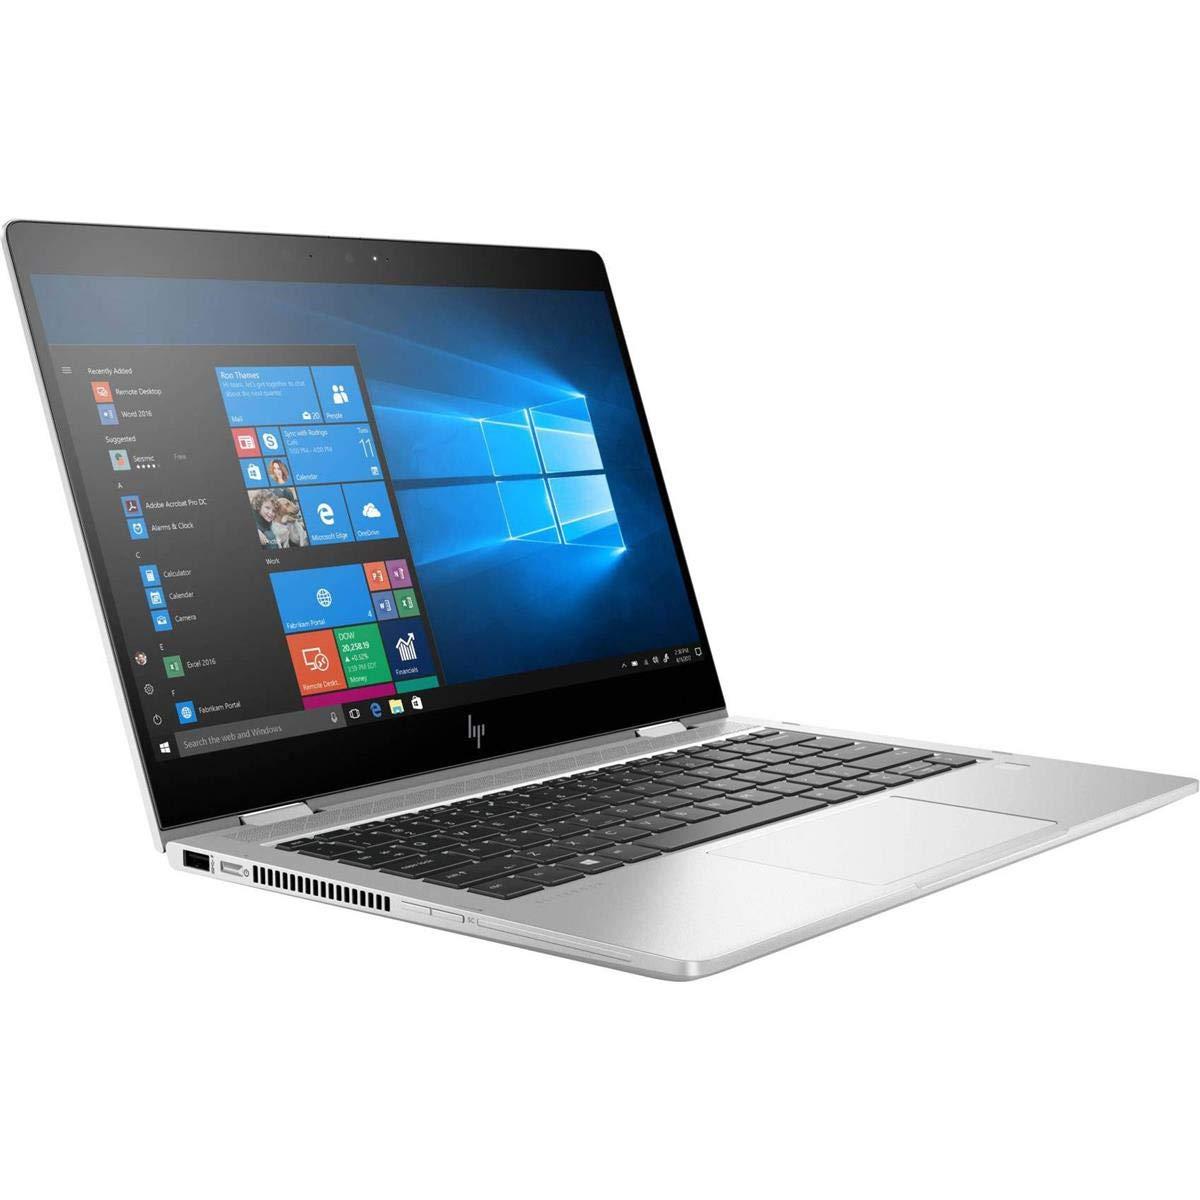 2020 HP ELITEBOOK X360 830 G6 2-in-1 13.3-inch FHD IPS